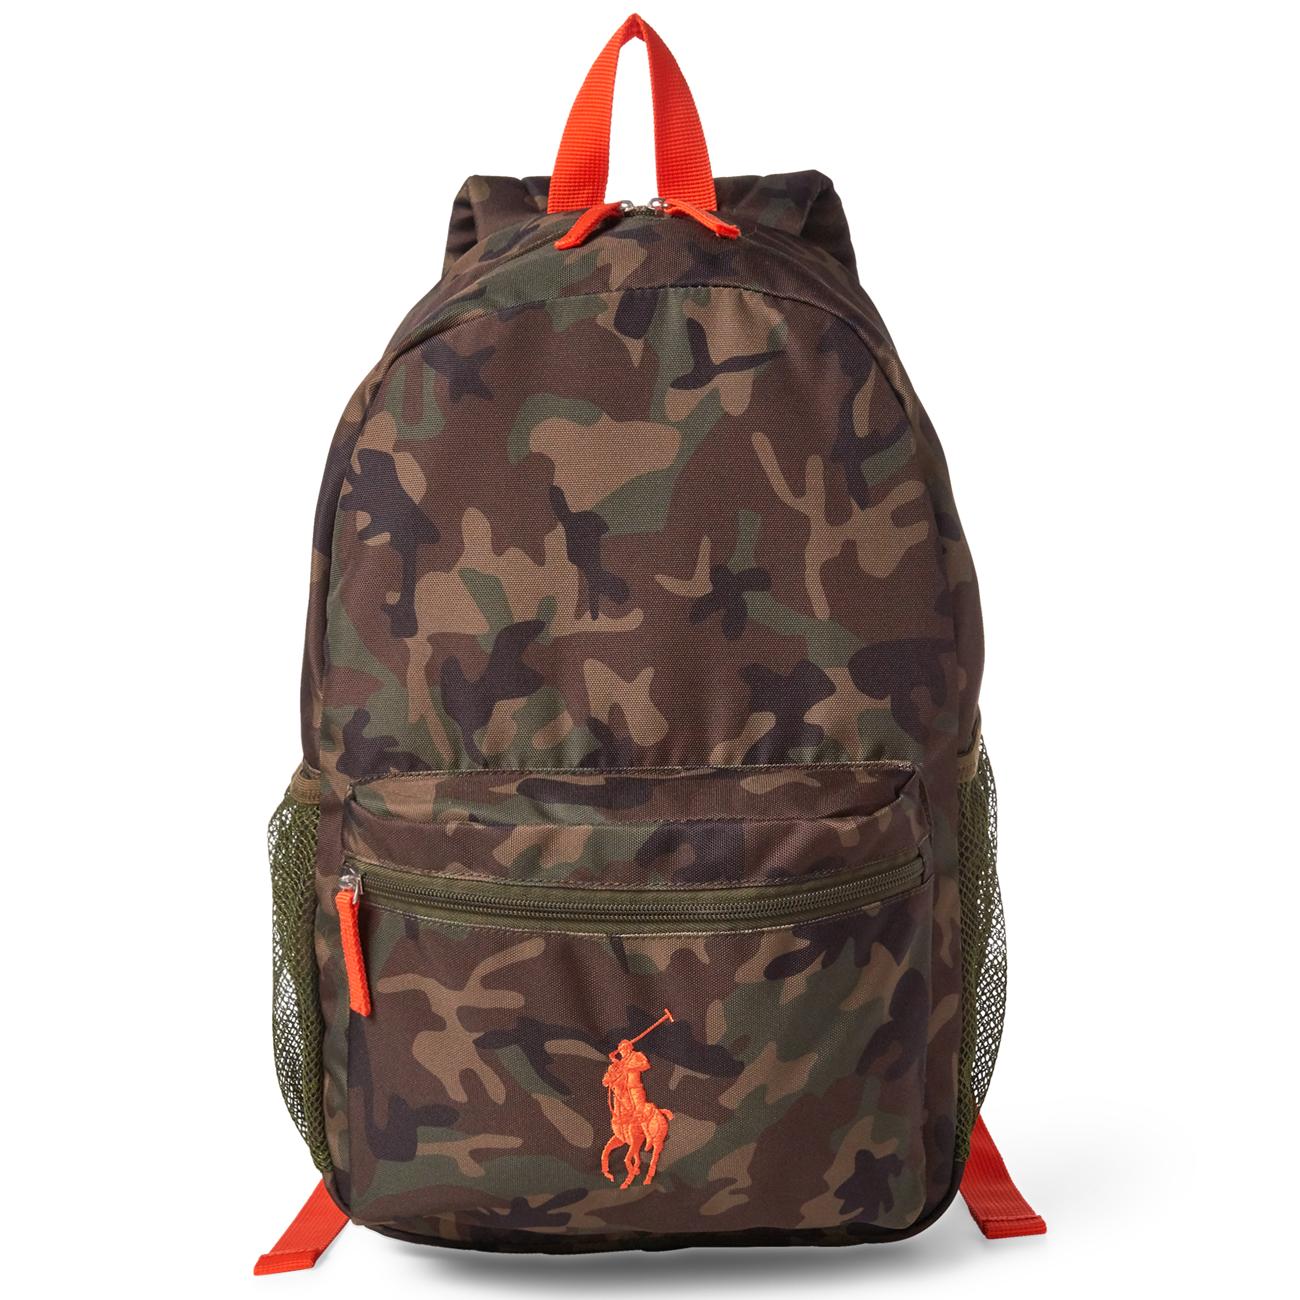 15a787f2f19b Polo Ralph Lauren Boy Backpack Camo. Ralph-lauren-butterfly-bowtie-gree-blue-groen-blaa  ...